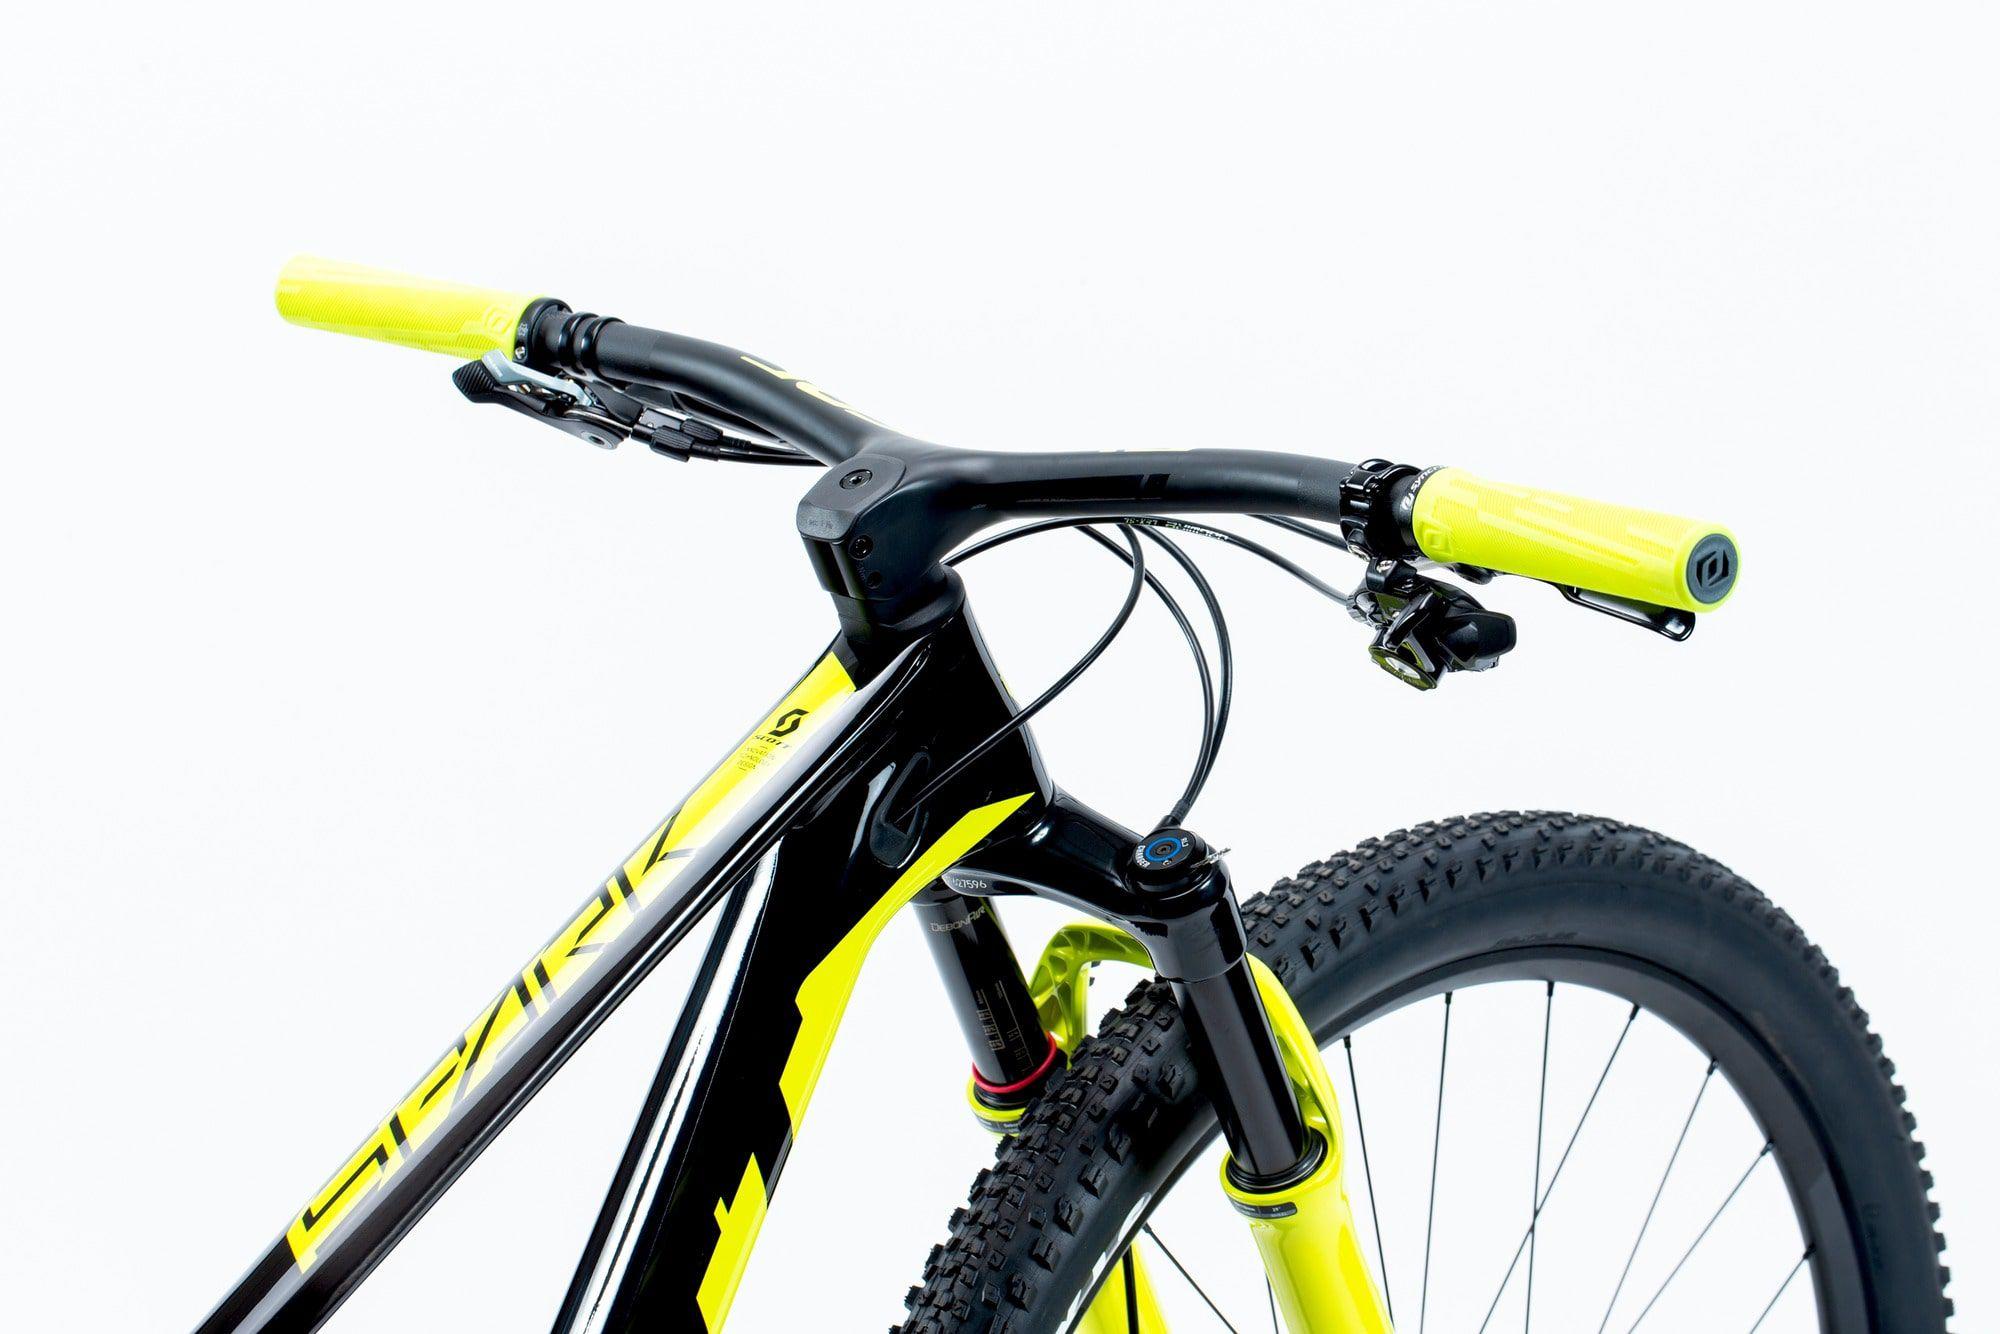 Bicicleta Scott Spark RC 900 World Cup 2019